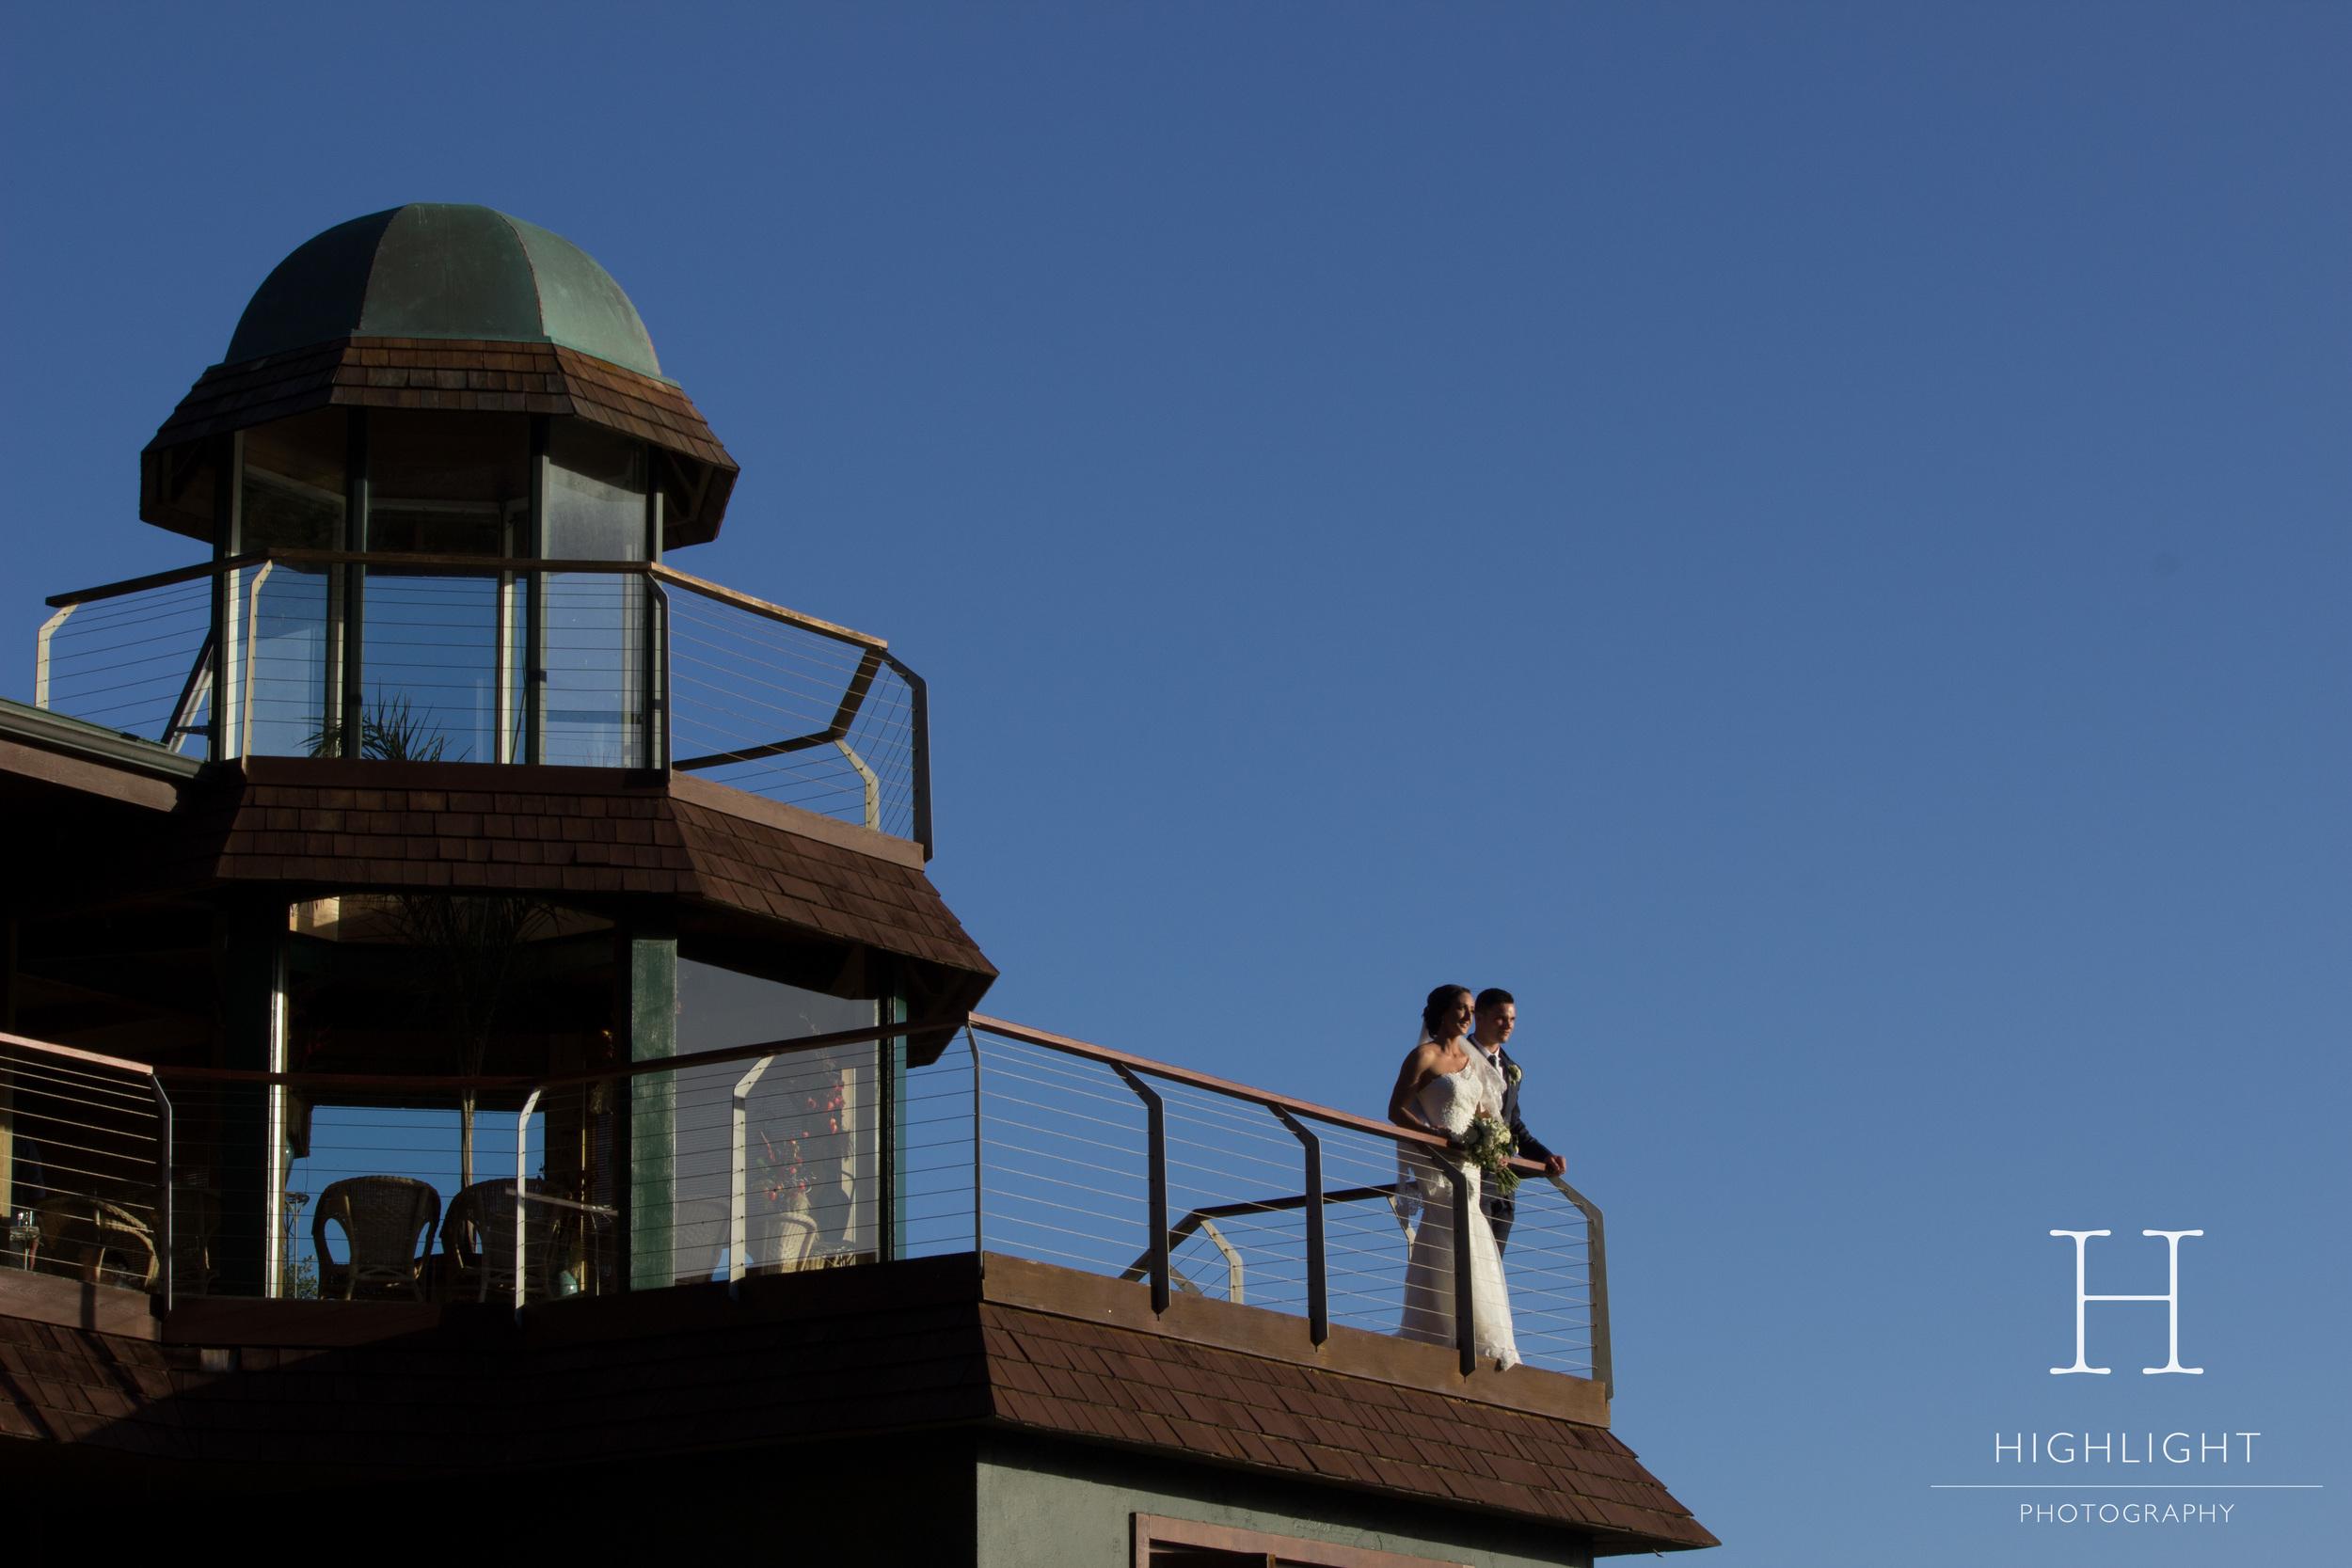 highlight_kc_bride_groom_wellington_pines_wedding.jpg